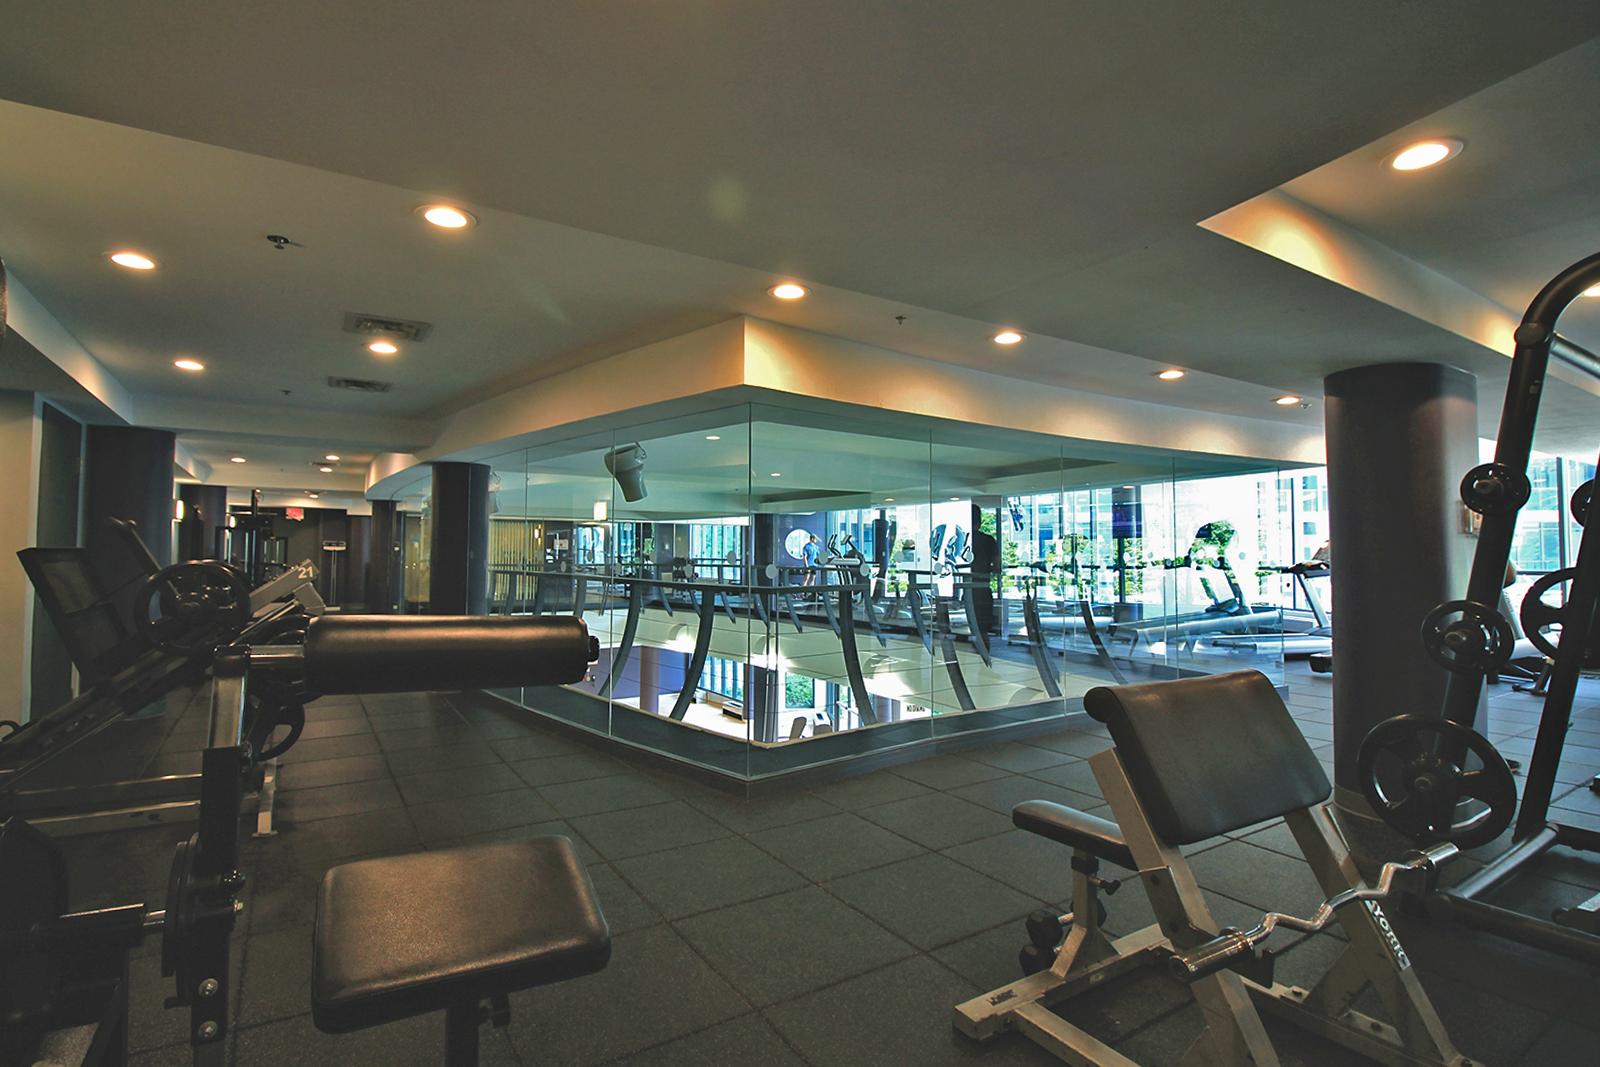 11 - Amenities - Gym.JPG